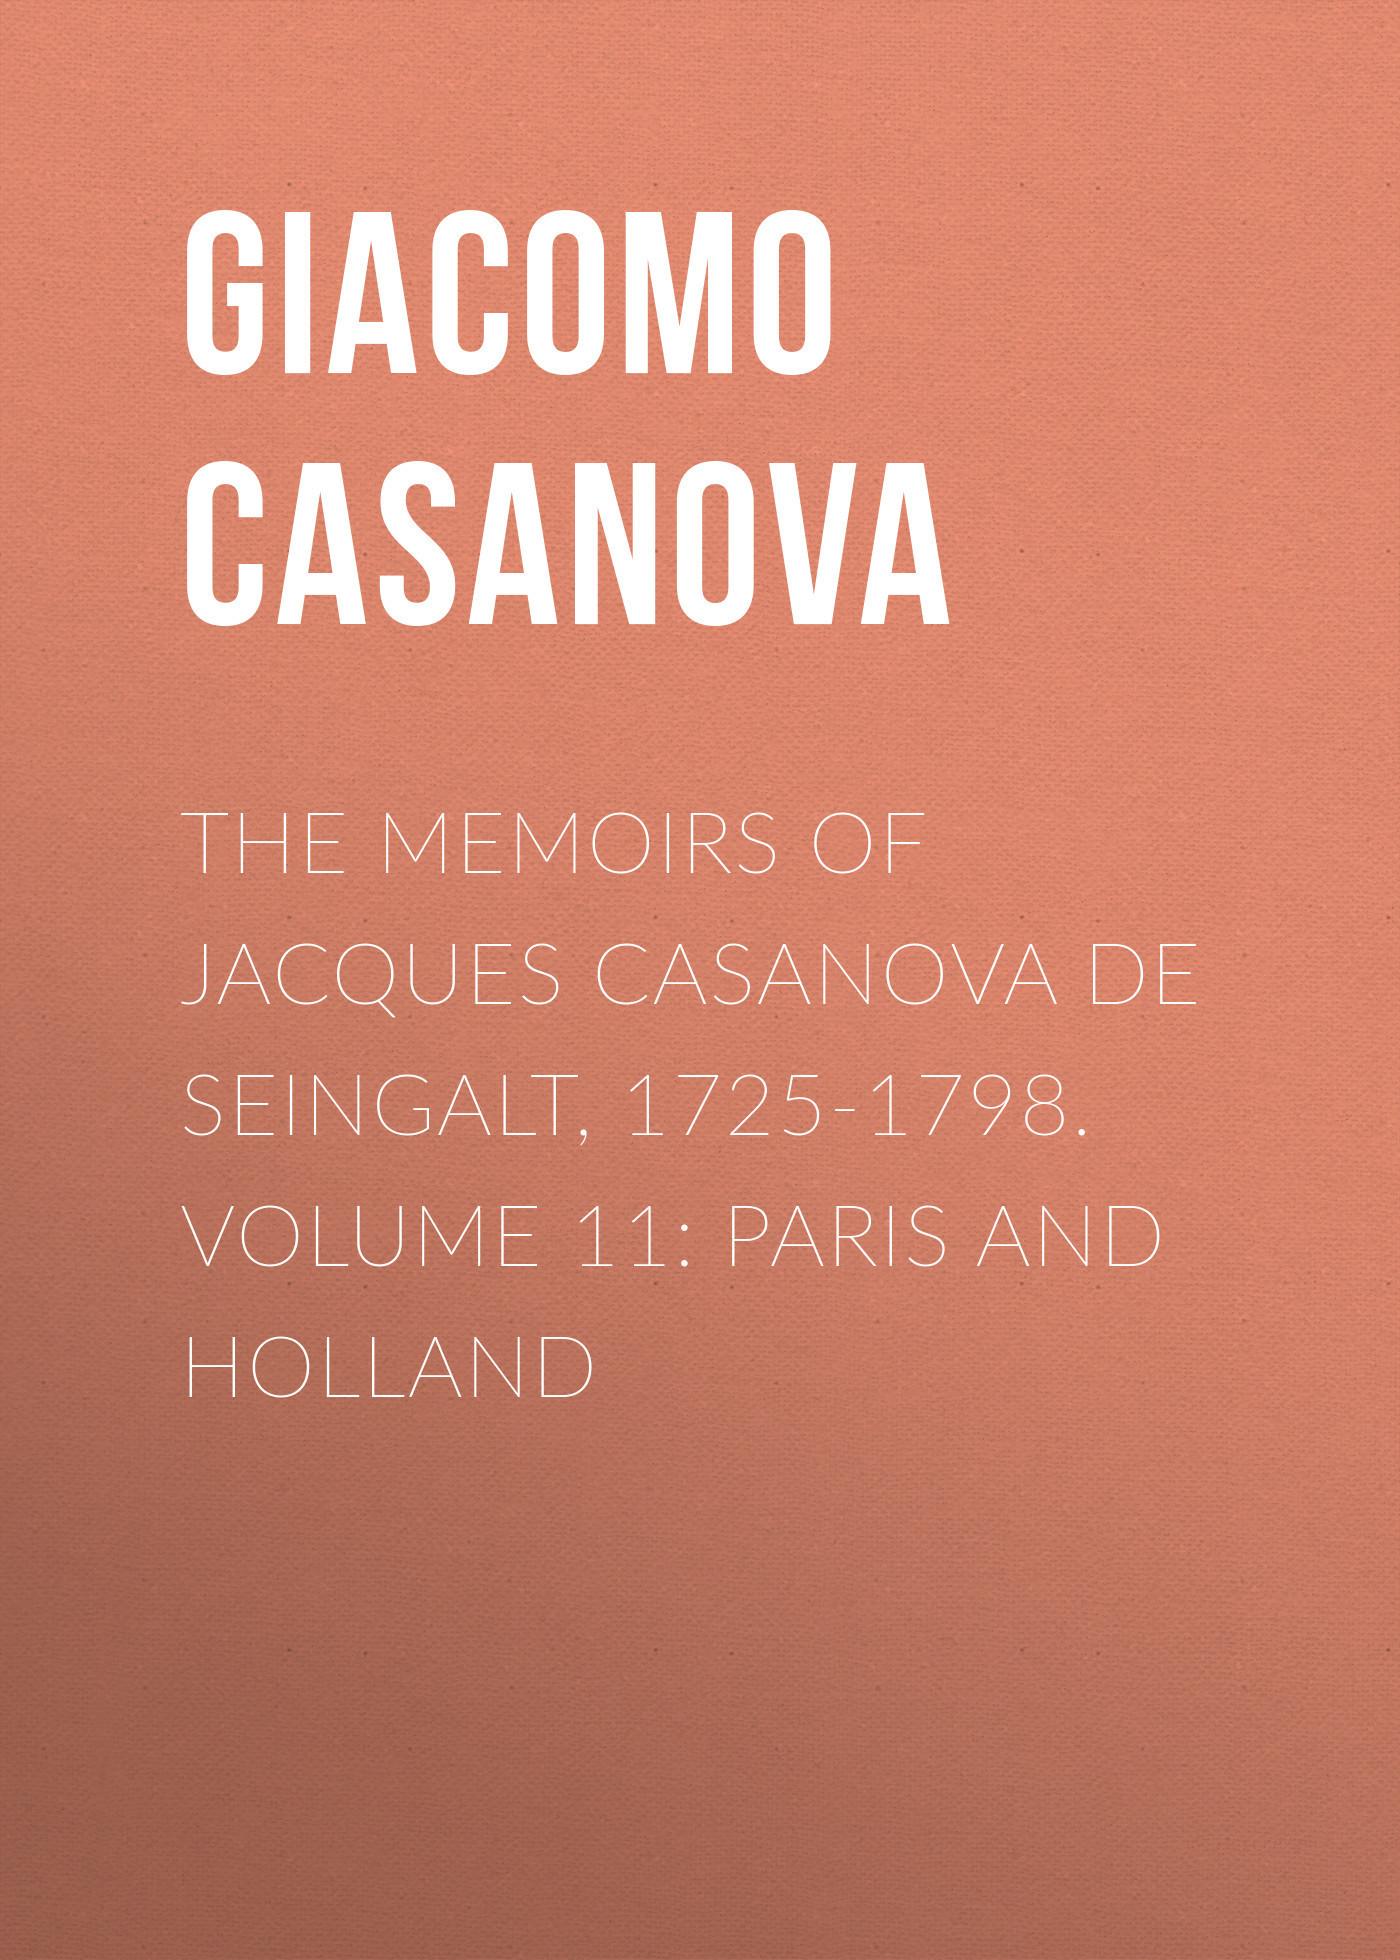 Giacomo Casanova The Memoirs of Jacques Casanova de Seingalt, 1725-1798. Volume 11: Paris and Holland new lone wolf and cub volume 11